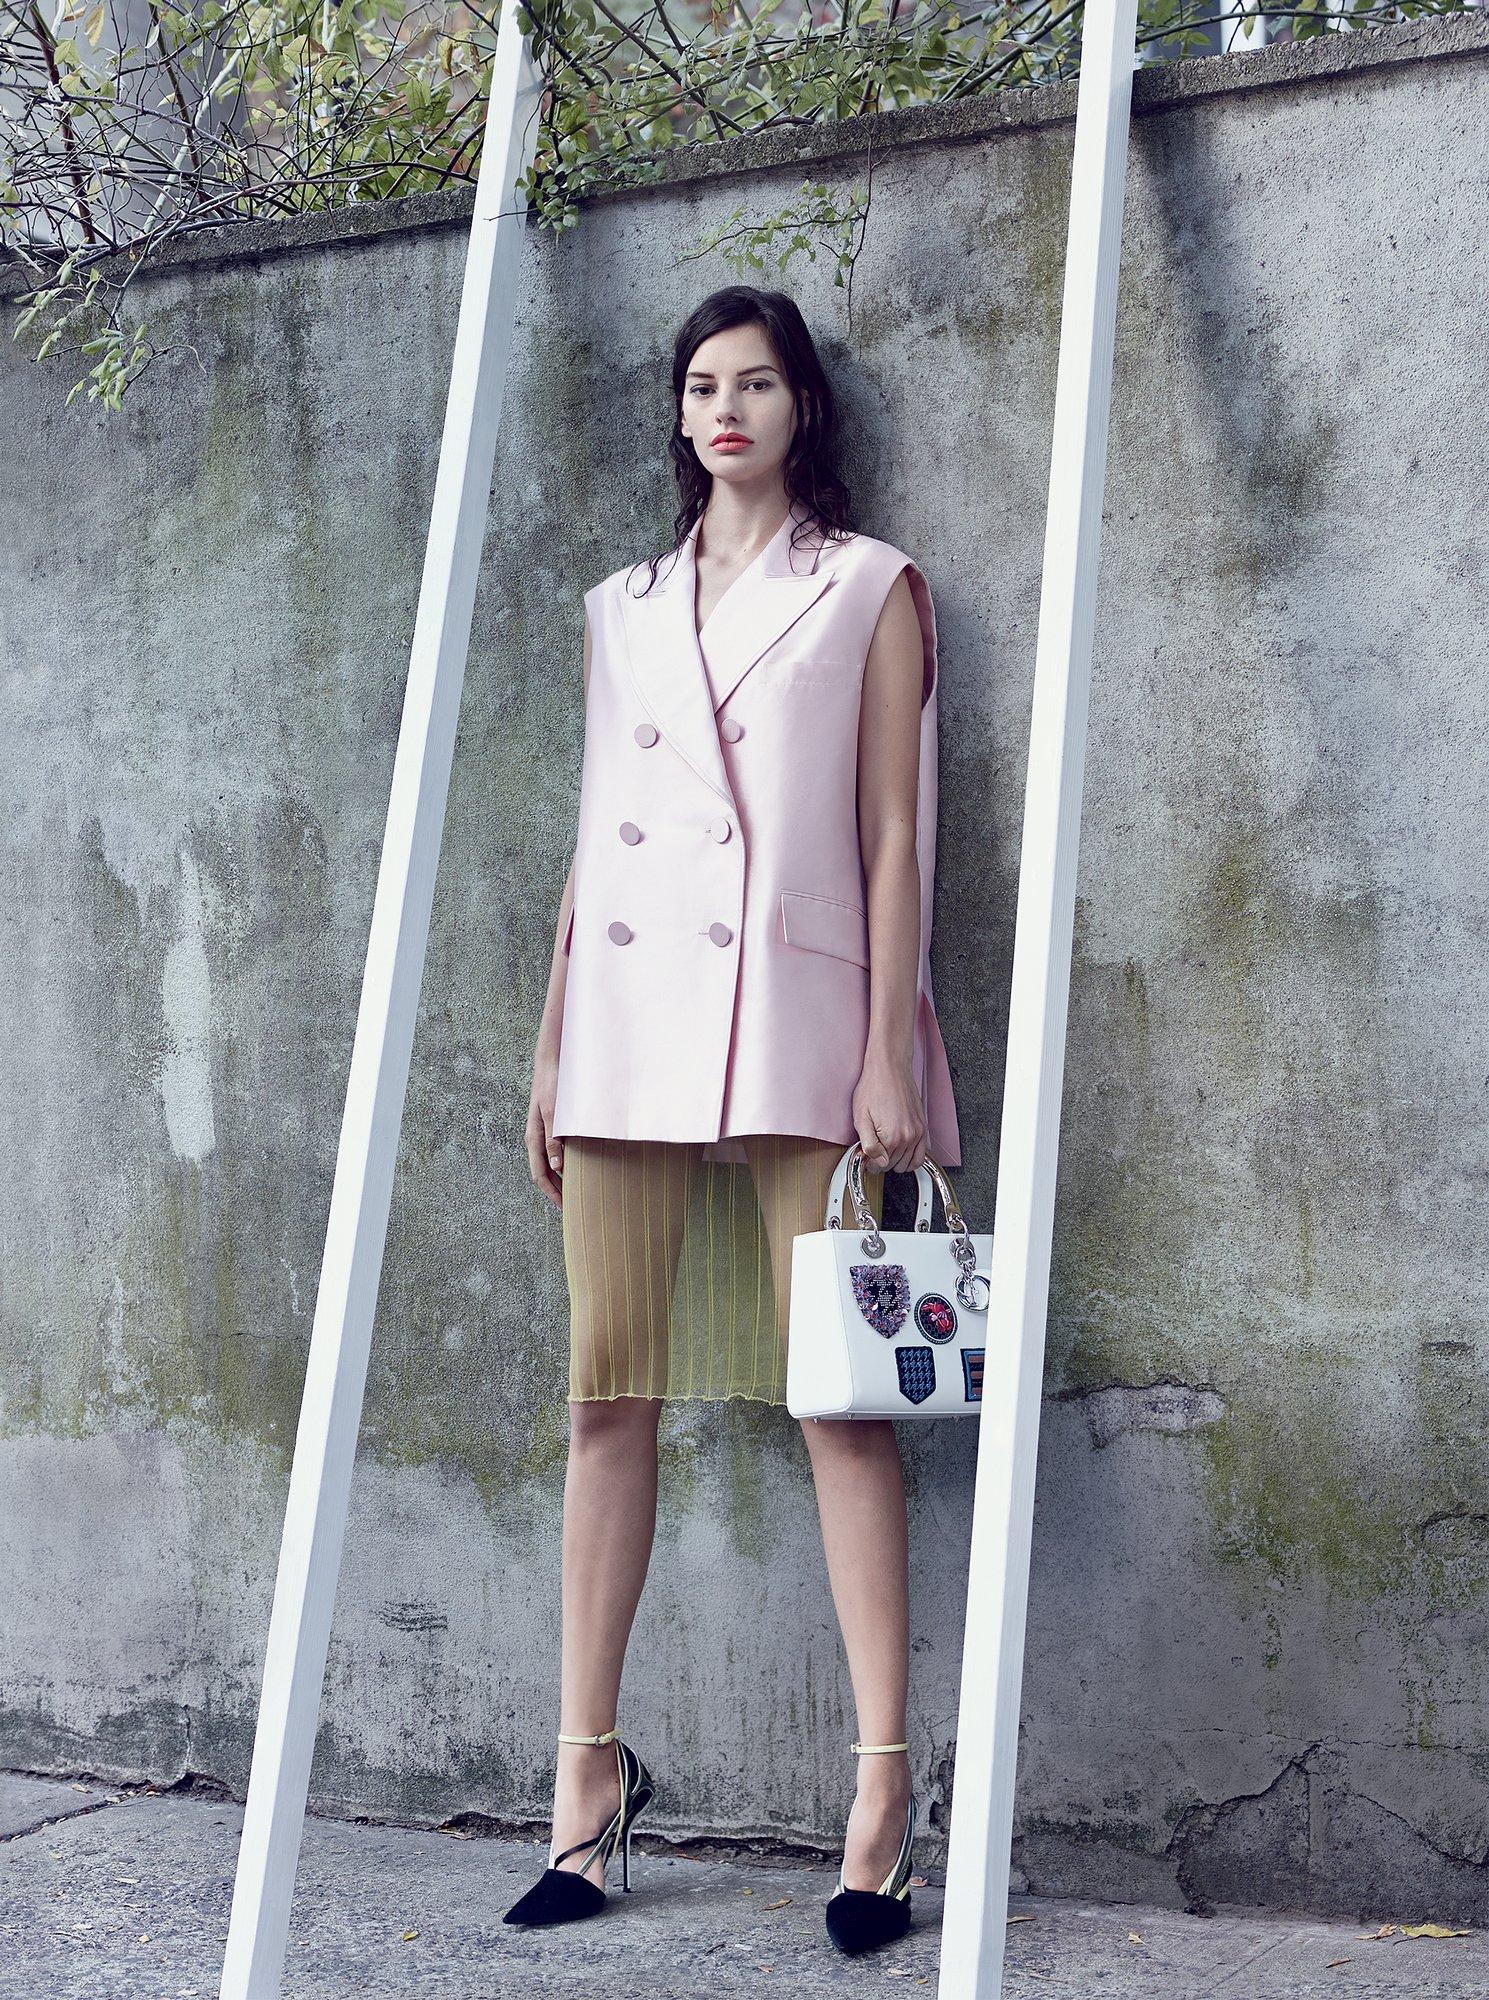 Amanda Murphy in Christian Dior